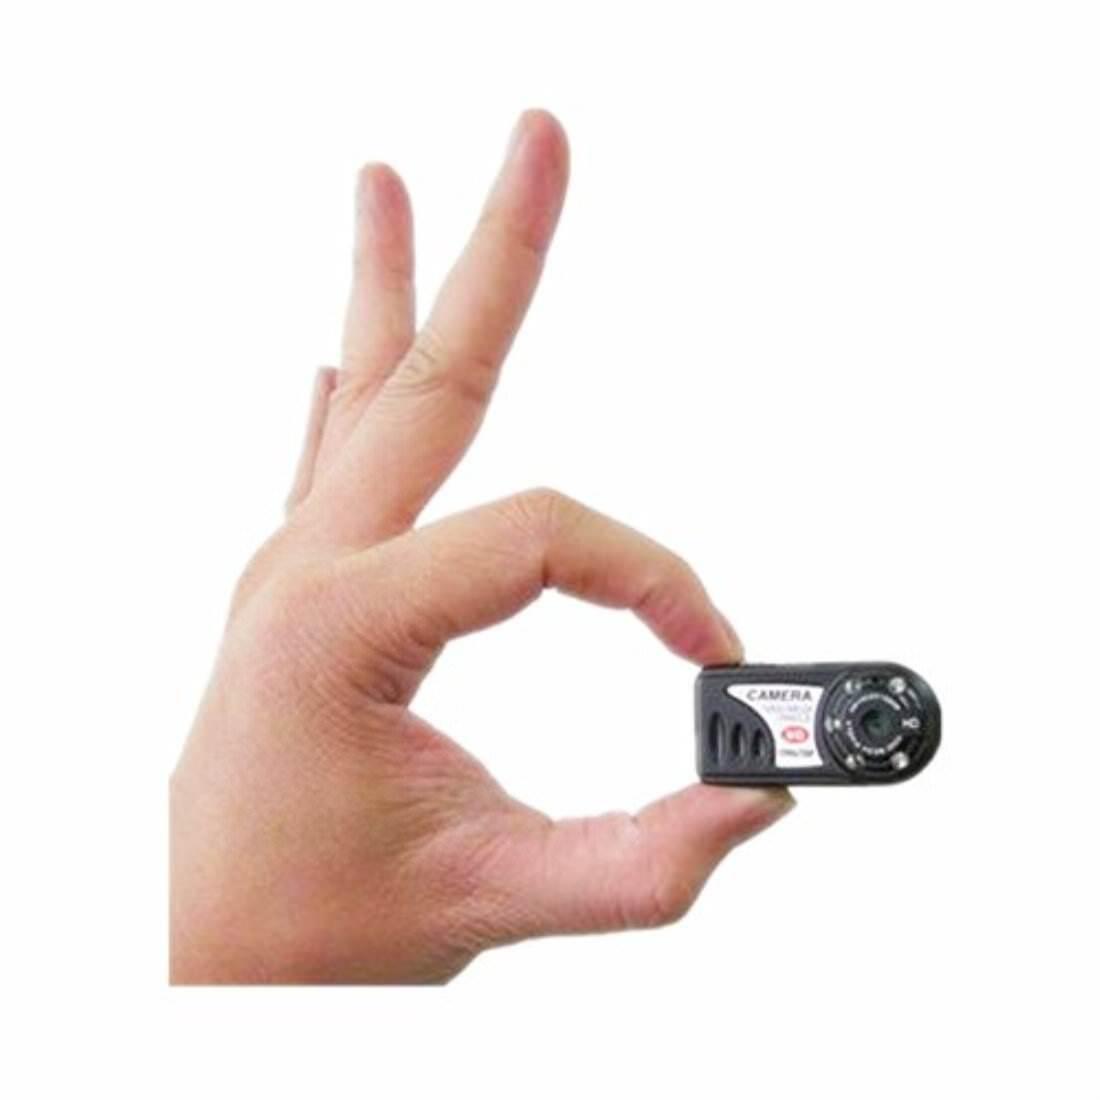 Mini Cam Hidden Spy Camera 1280x720P Video Recorder Security Voice Recording 8GB